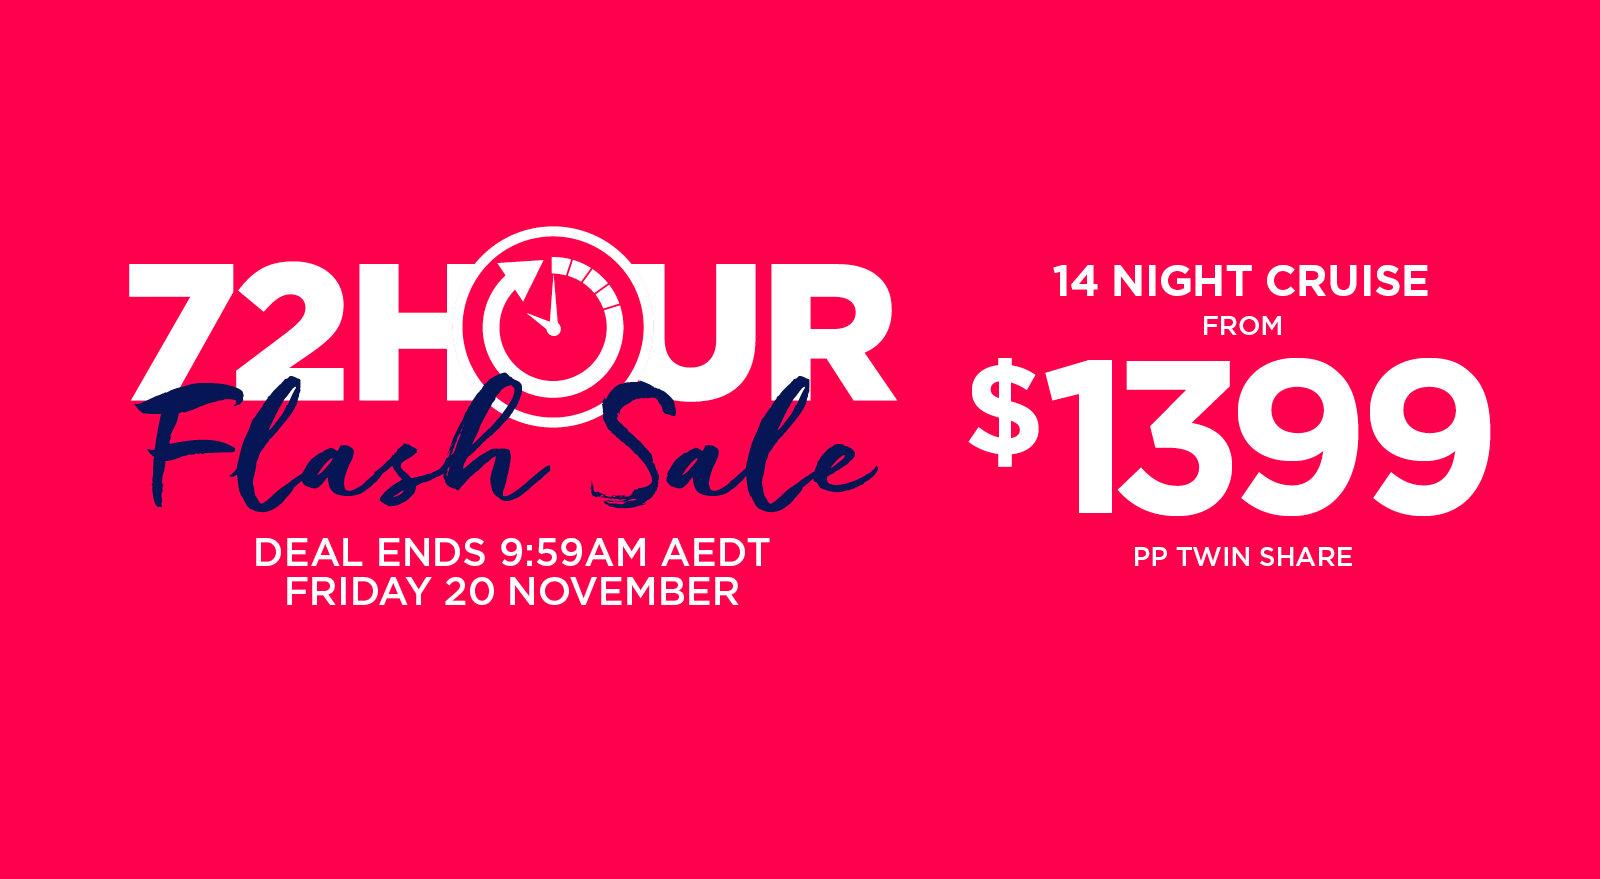 Royal Caribbean Australia Offering 72 Hour Cruise Sale